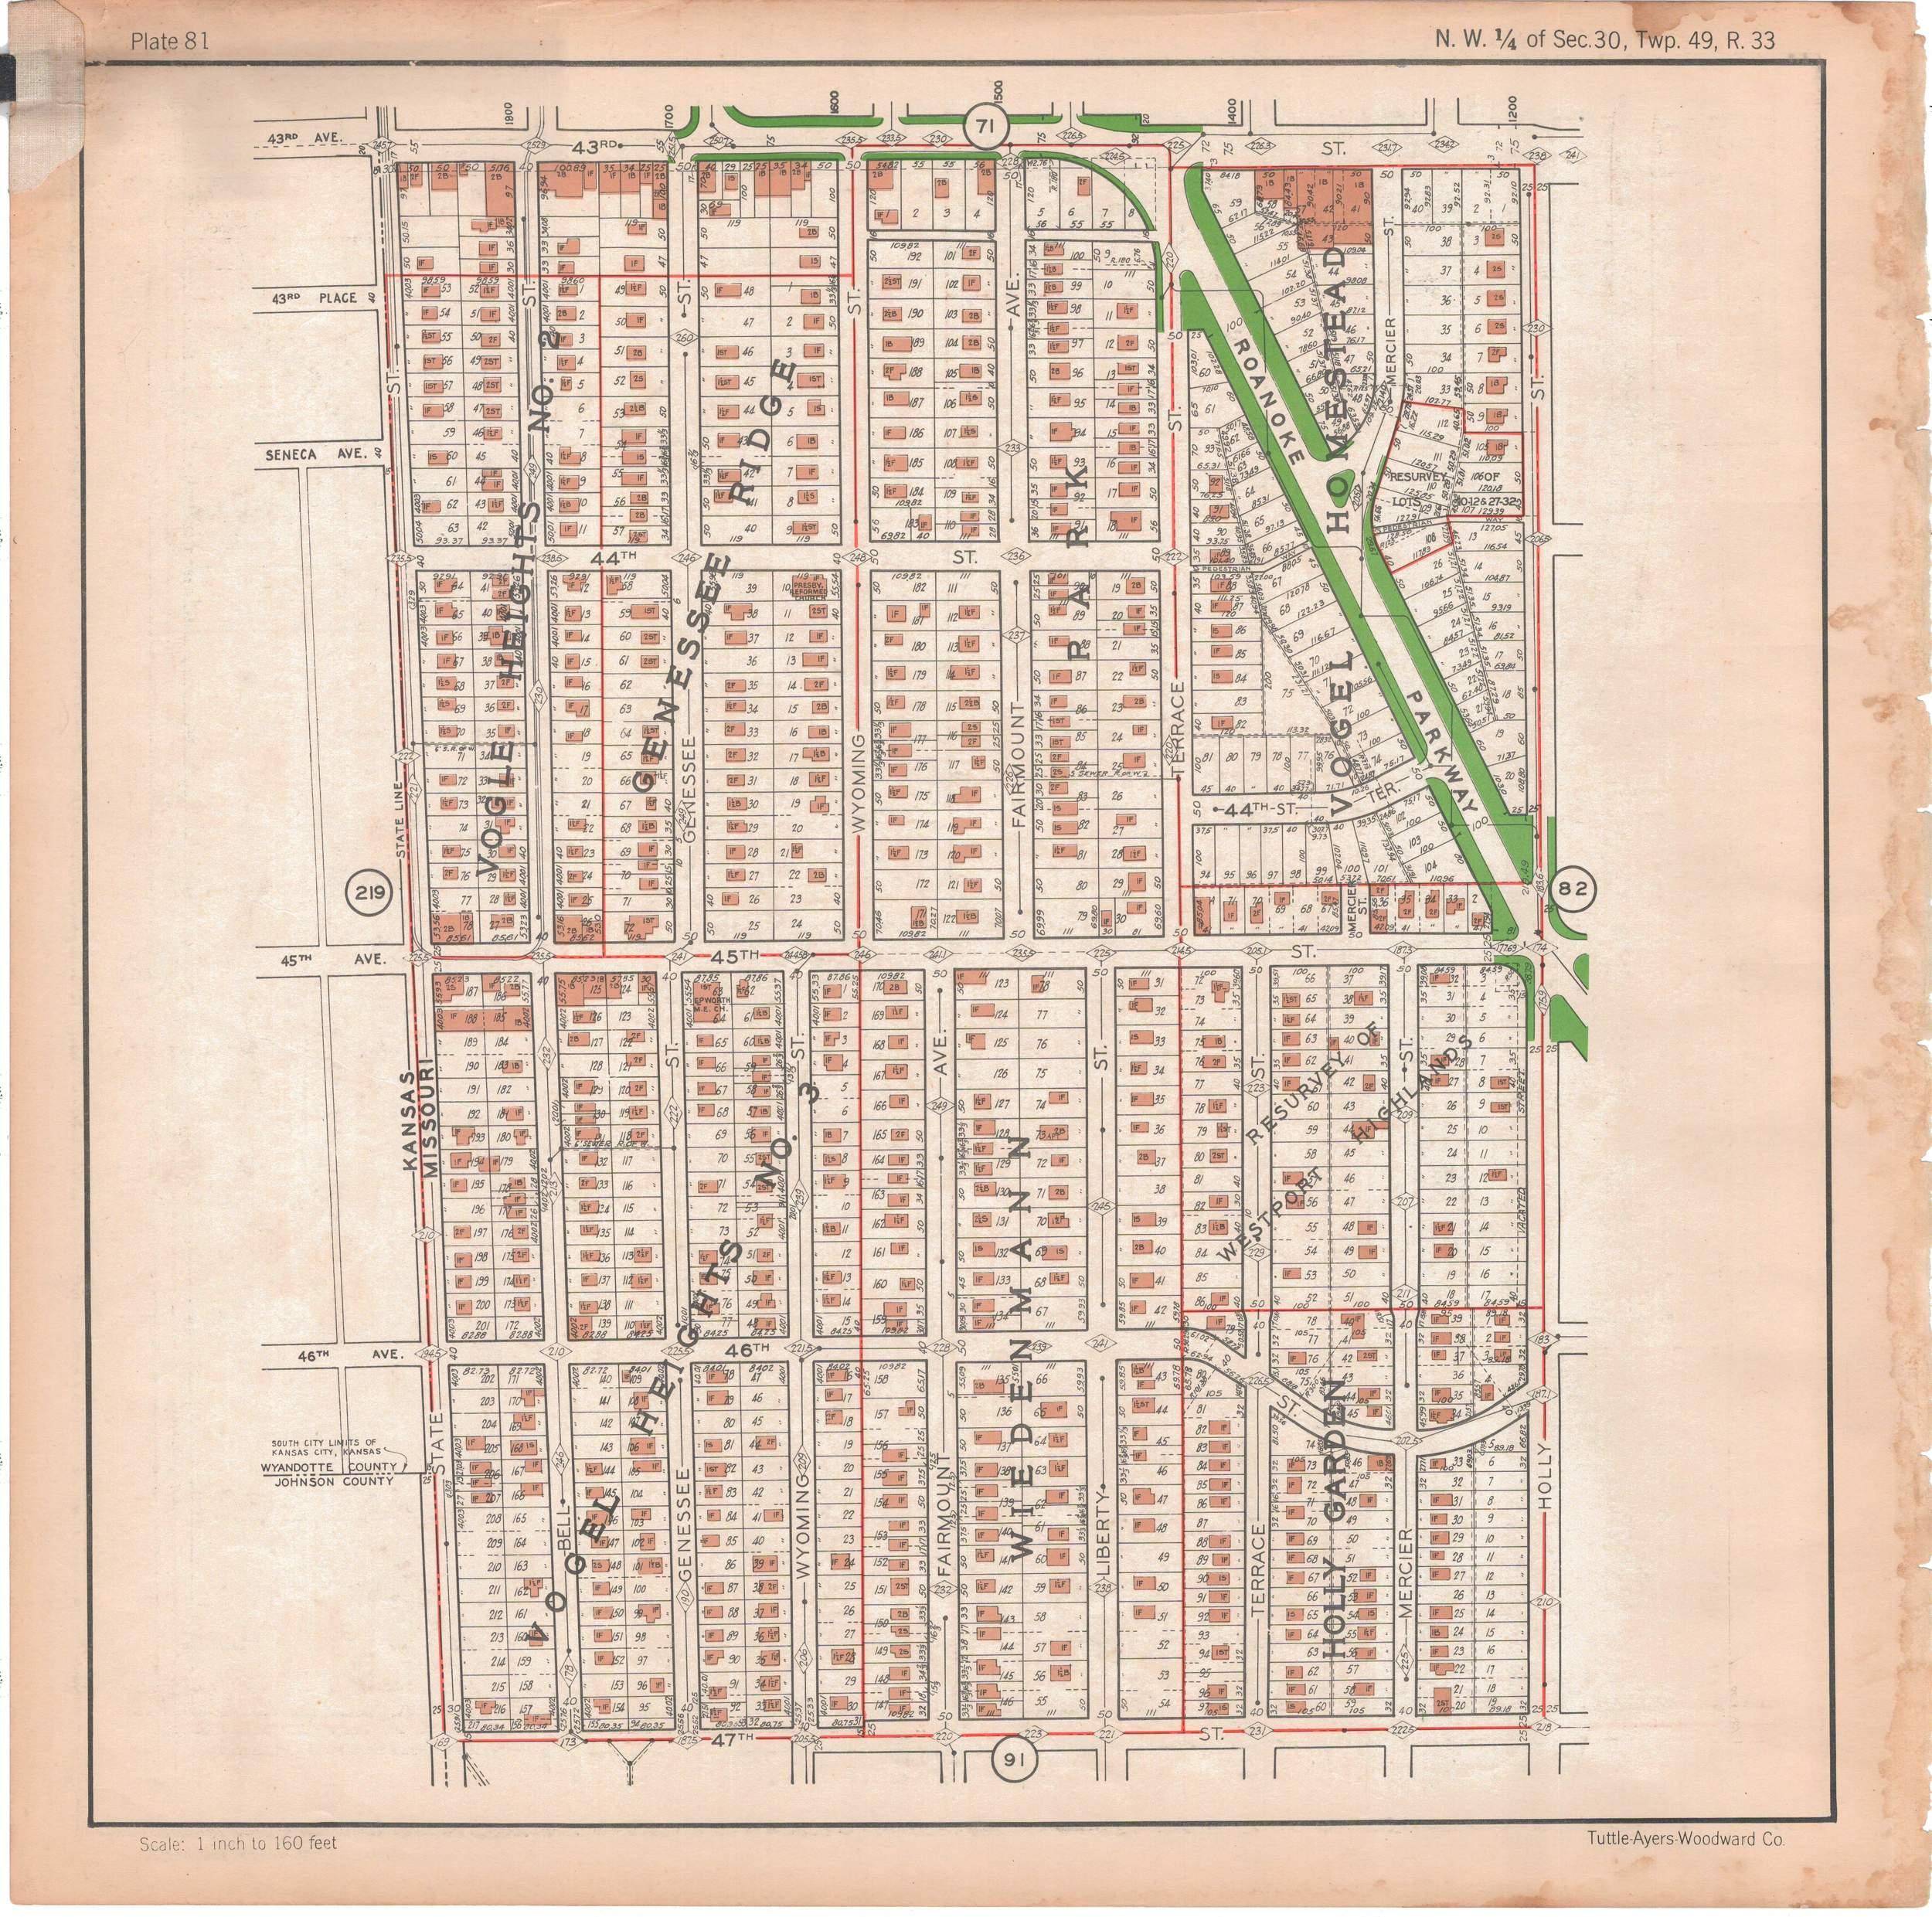 1925 TUTTLE_AYERS_Plate 81.JPG